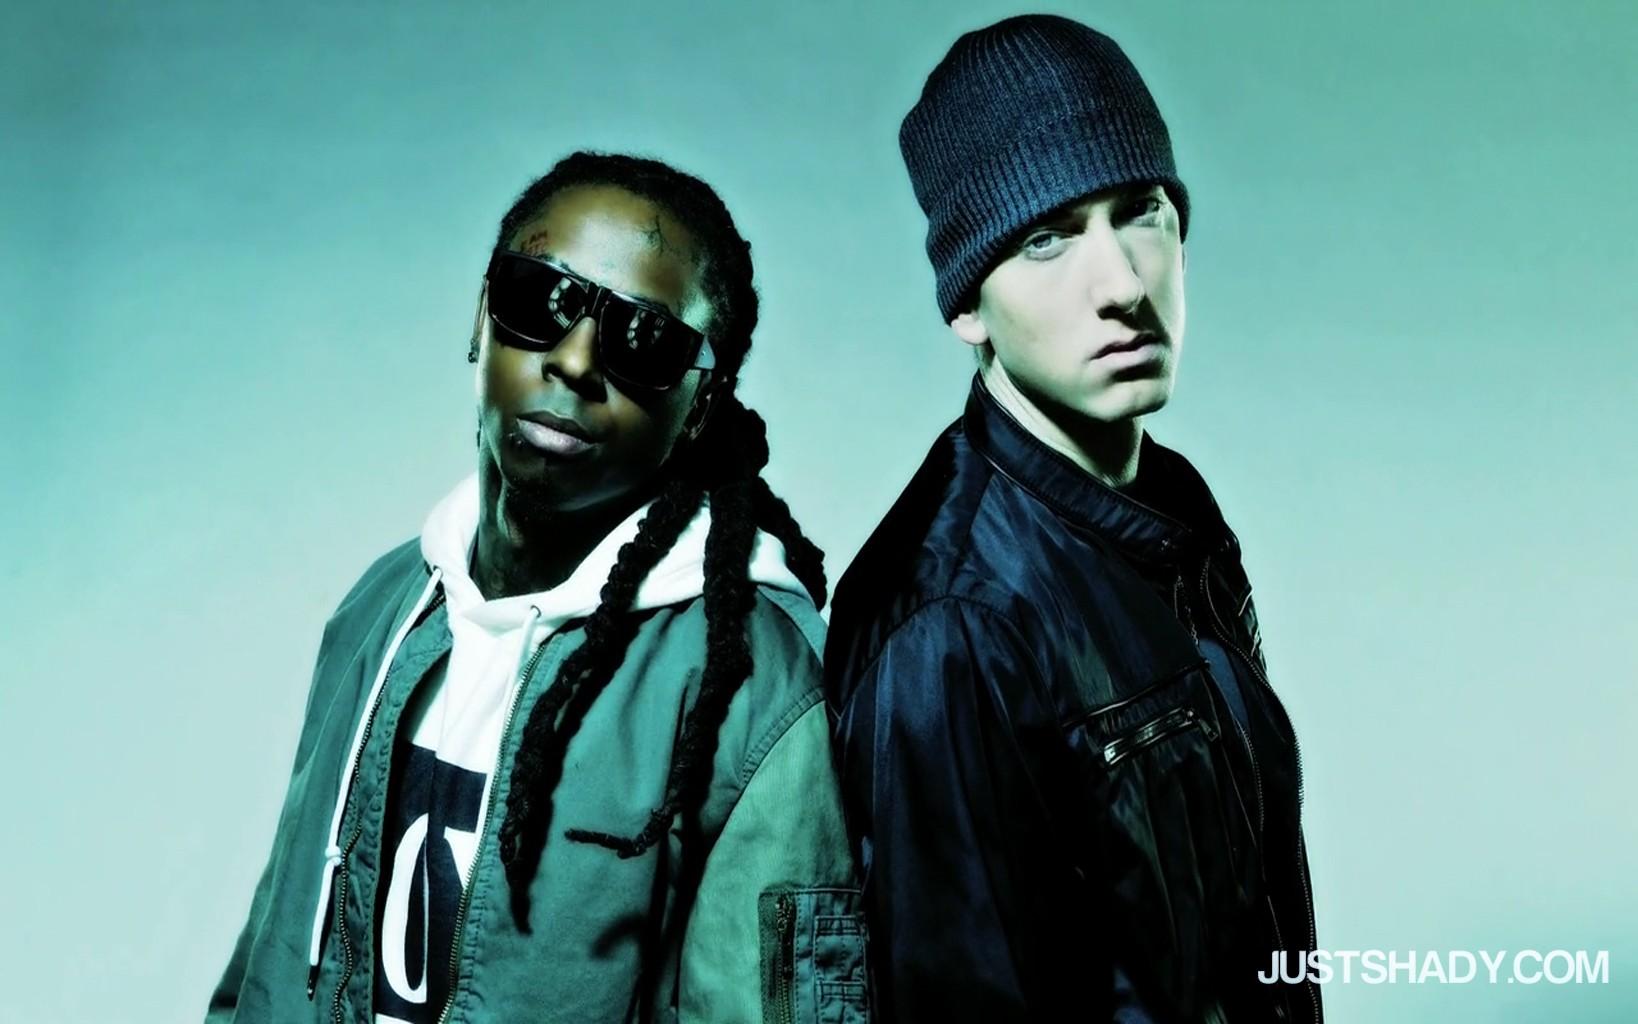 Lil Wayne and Eminem Rap Wallpapers 1638x1024